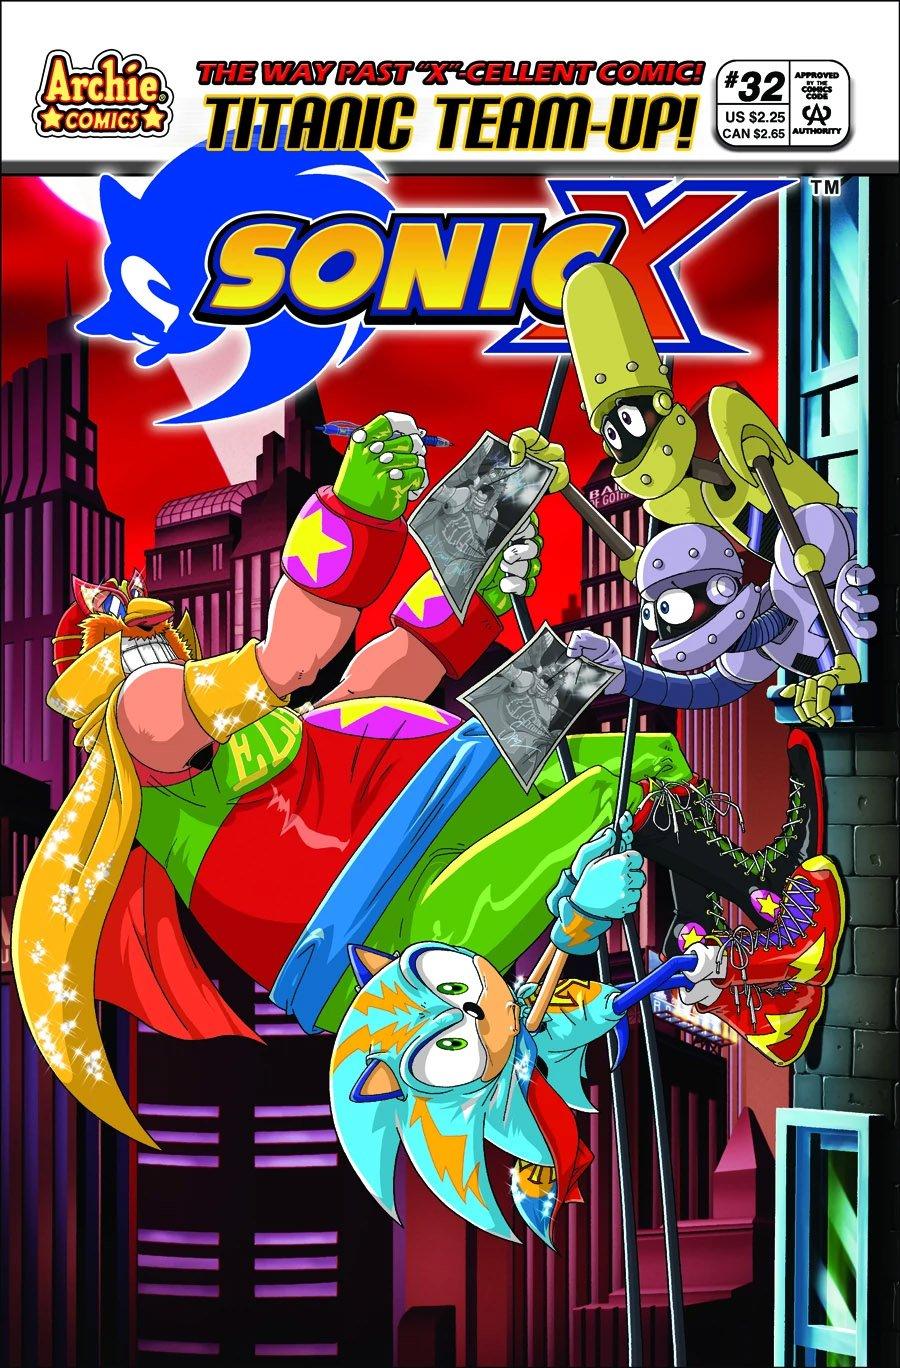 Sonic X 032 (June 2008)